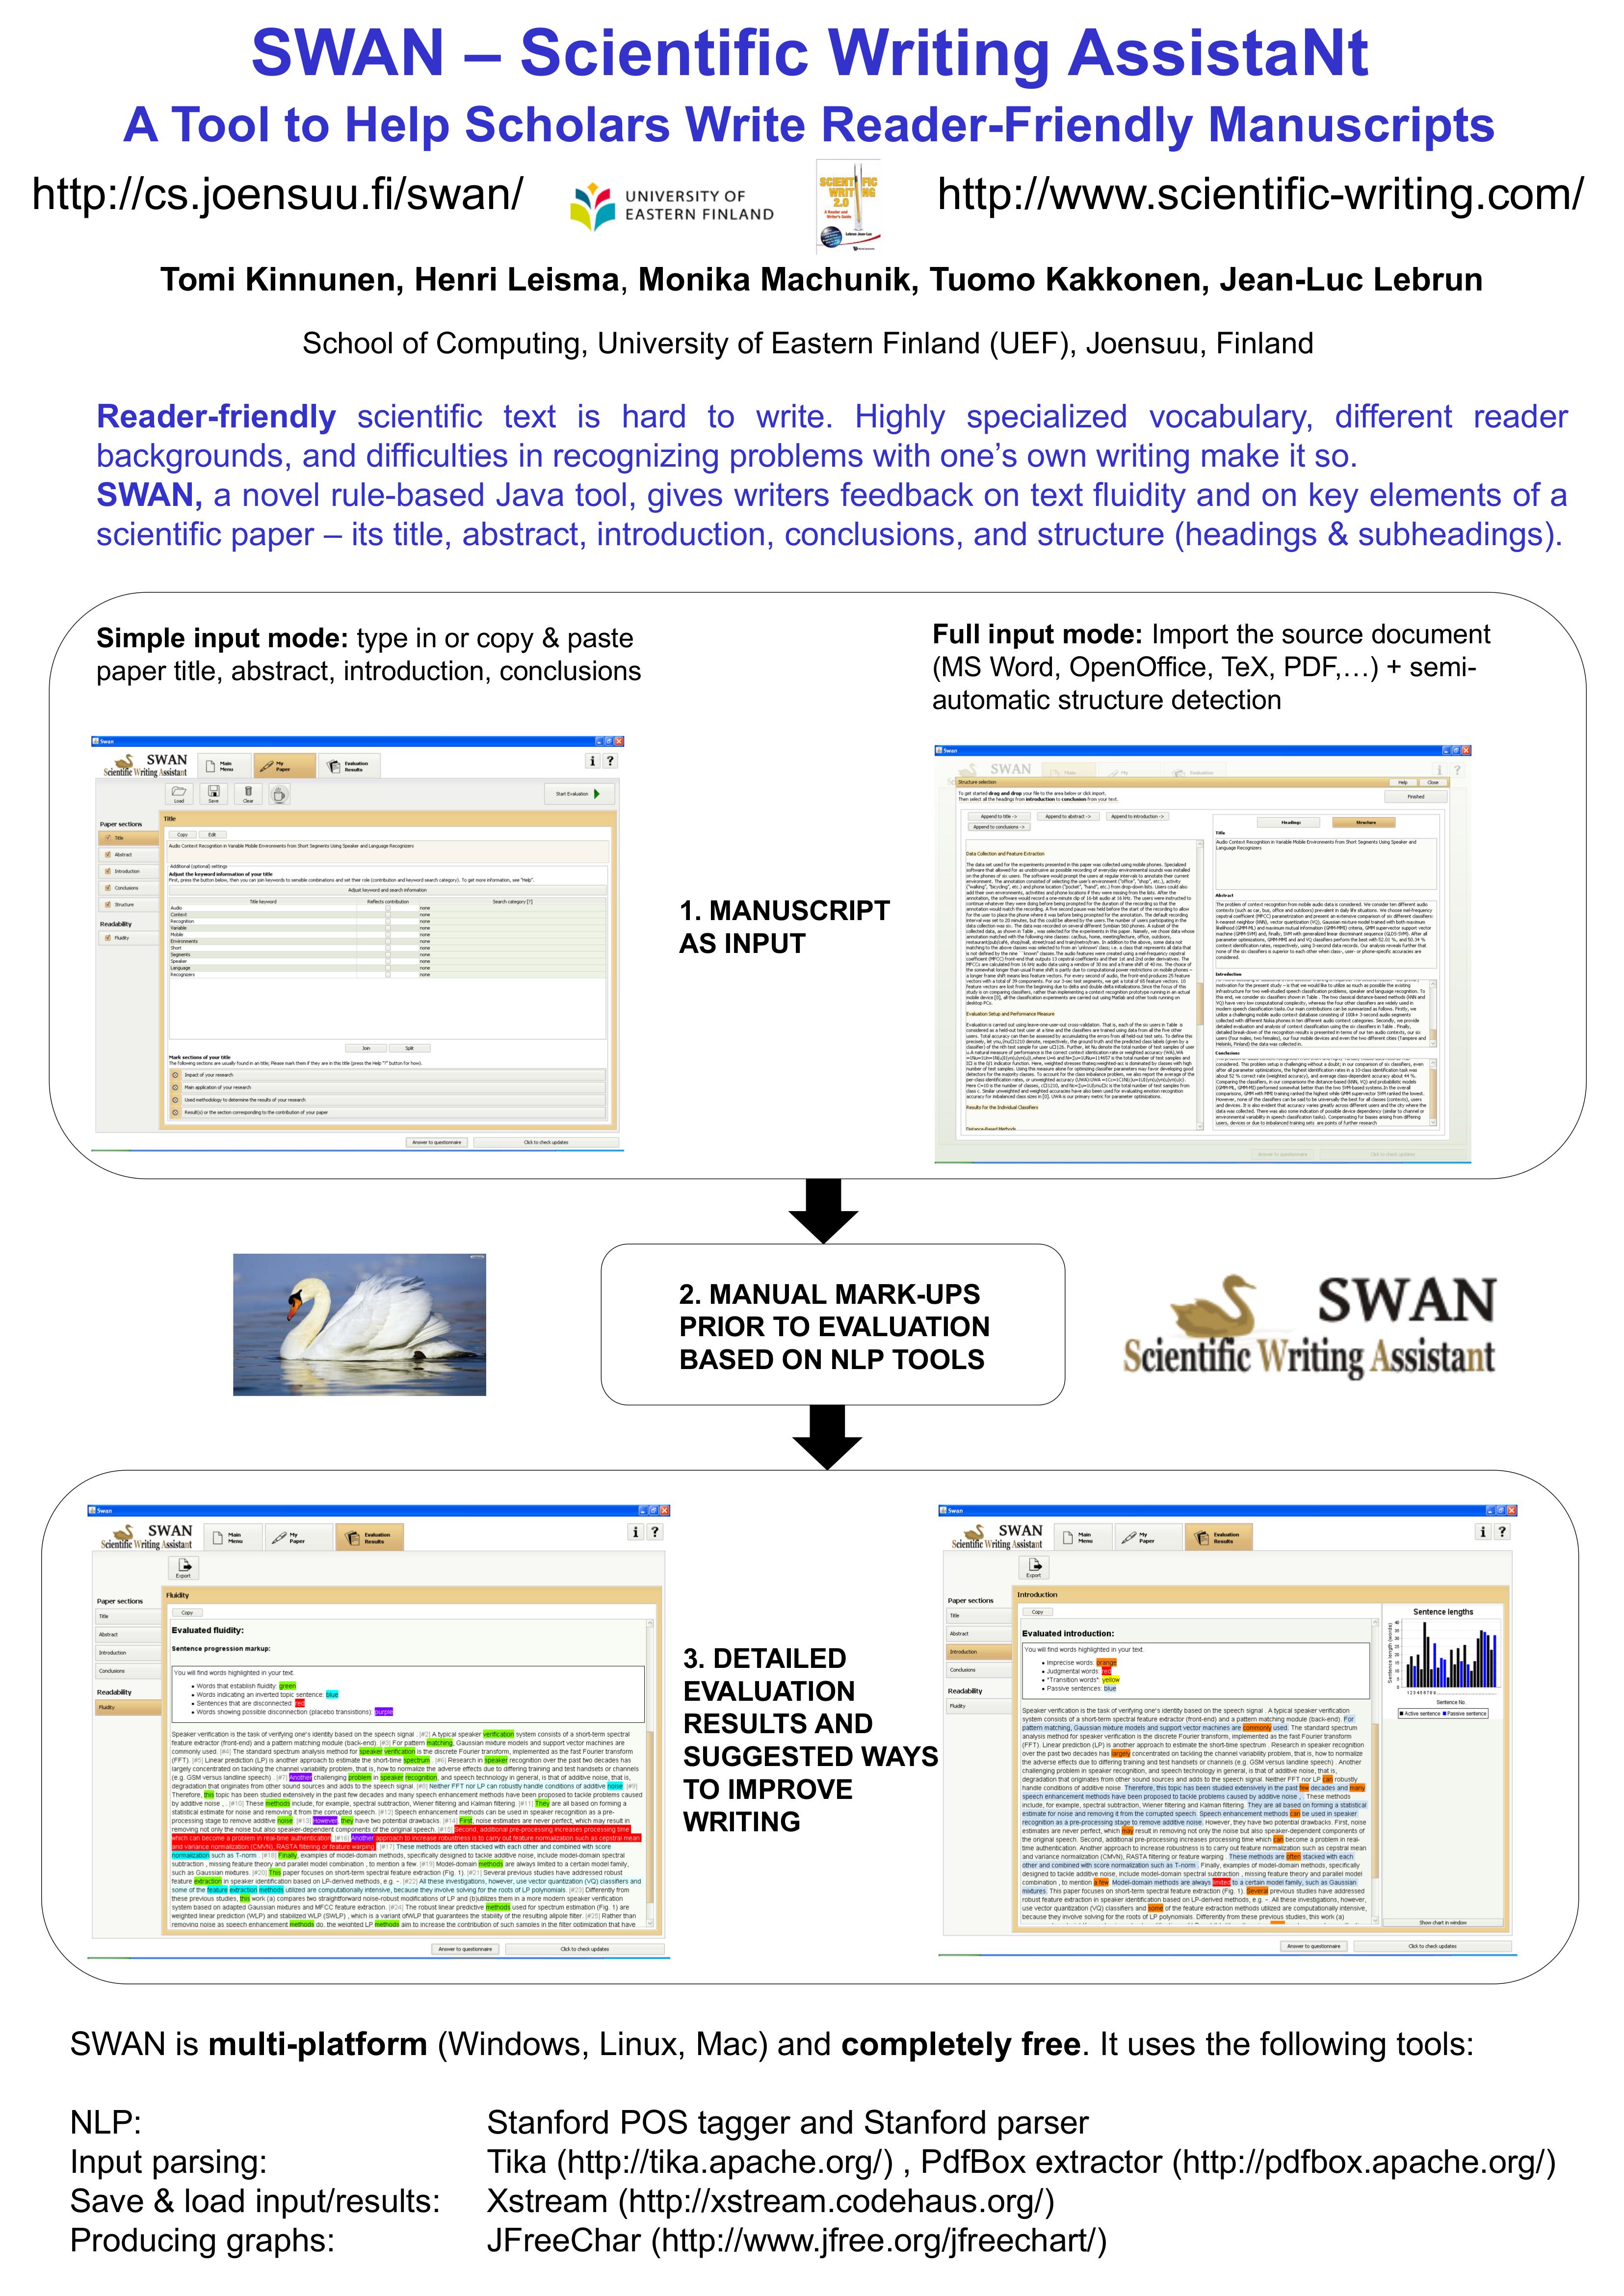 writers guide httpscientific presentationscom